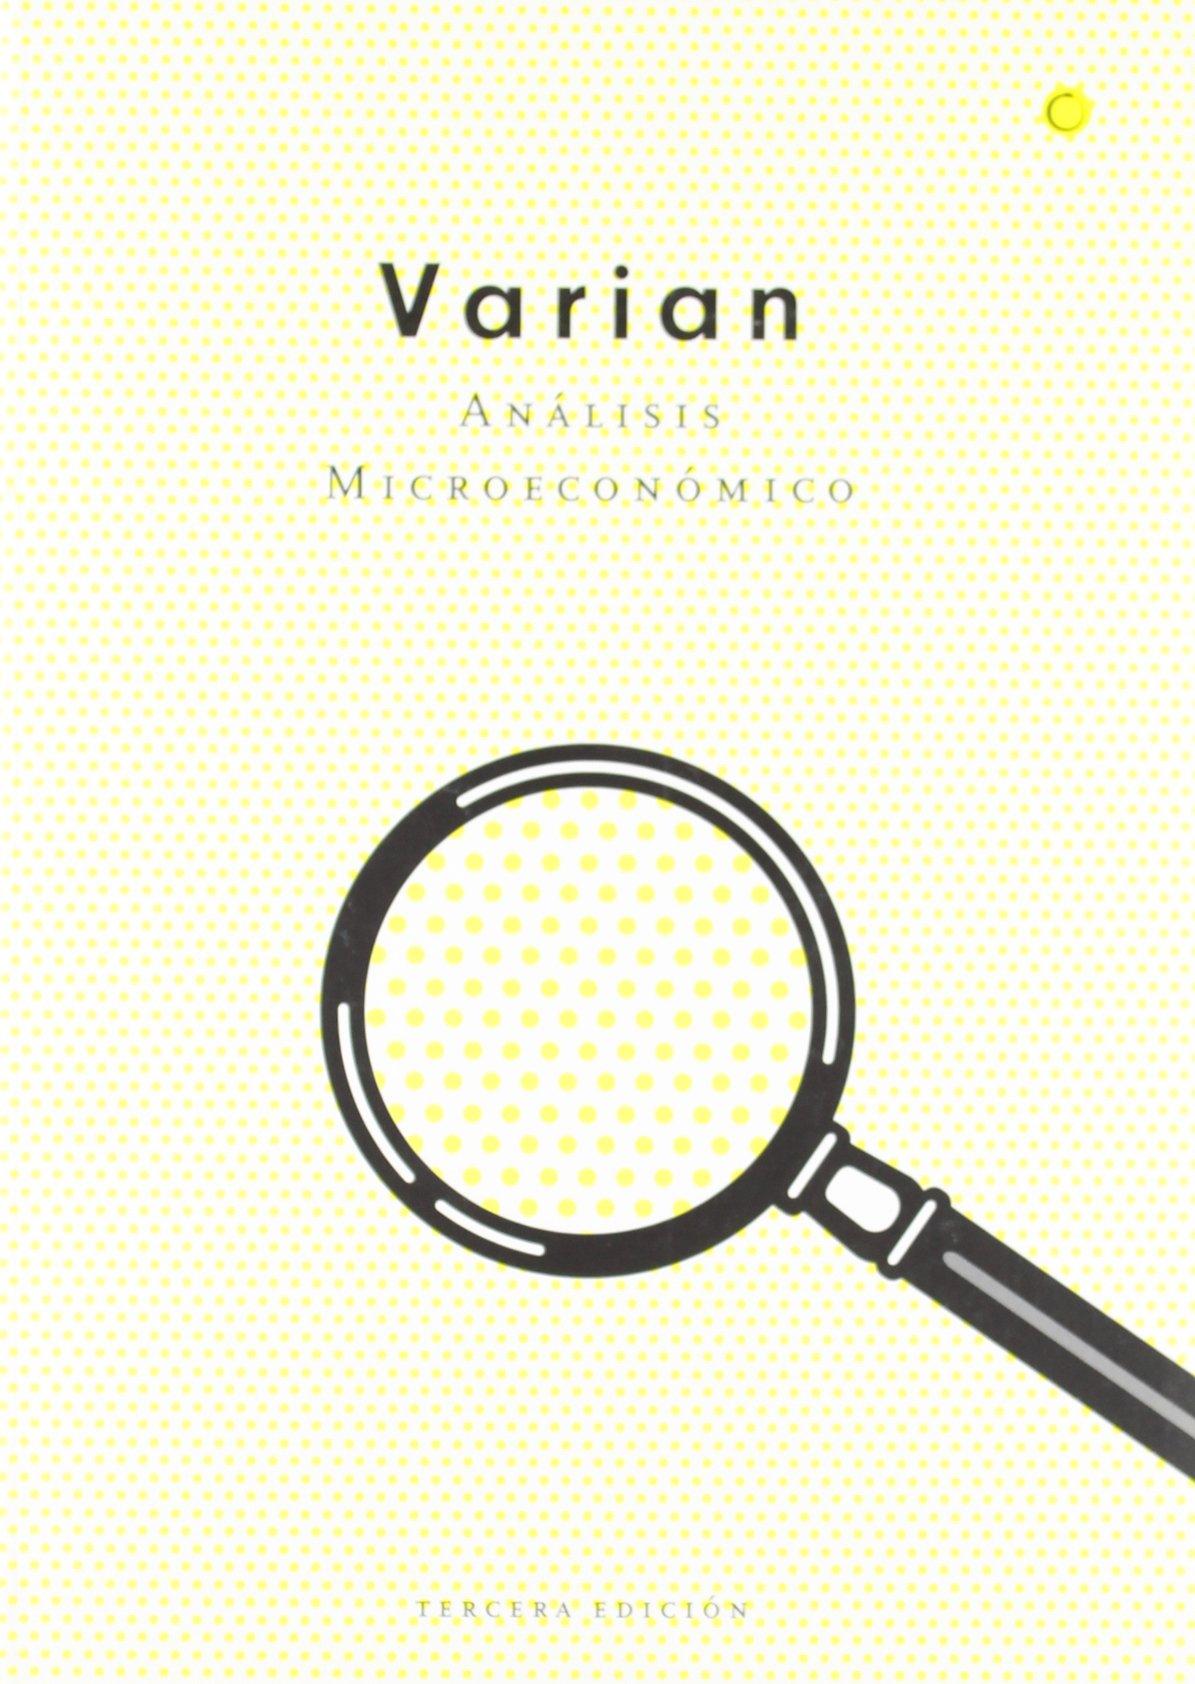 Analisis Microeconomico - 3 Edicion (Spanish Edition)